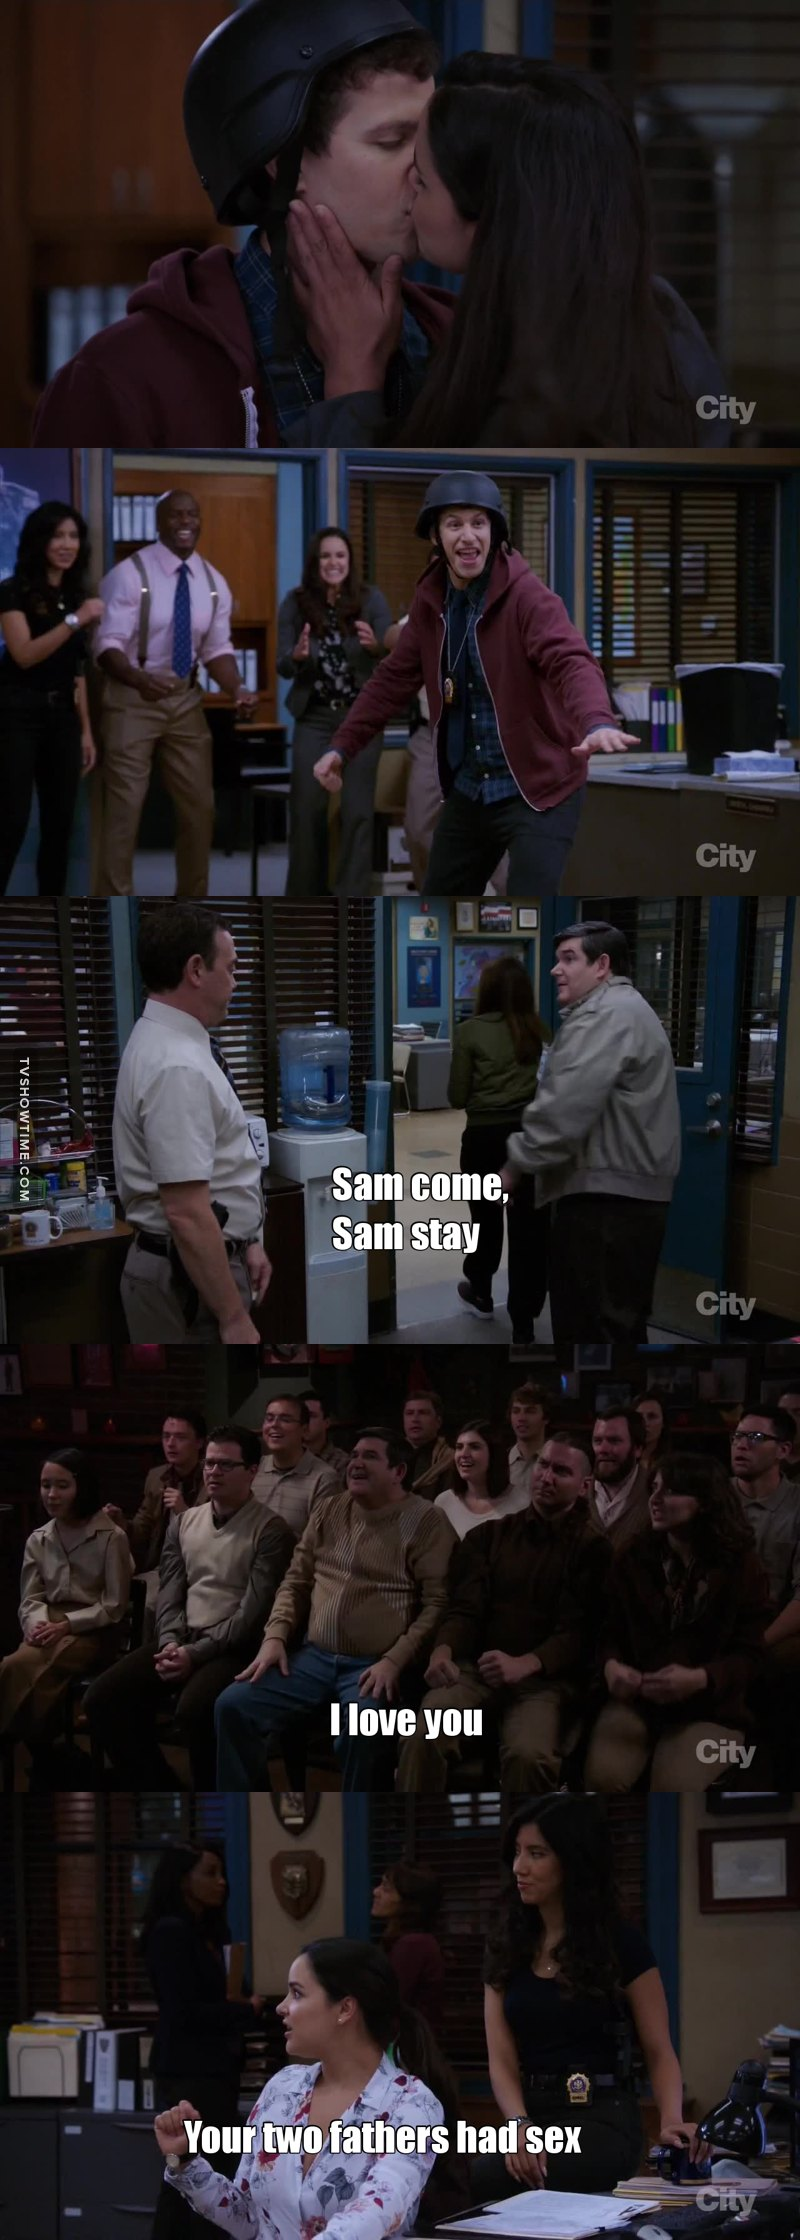 Episode highlights